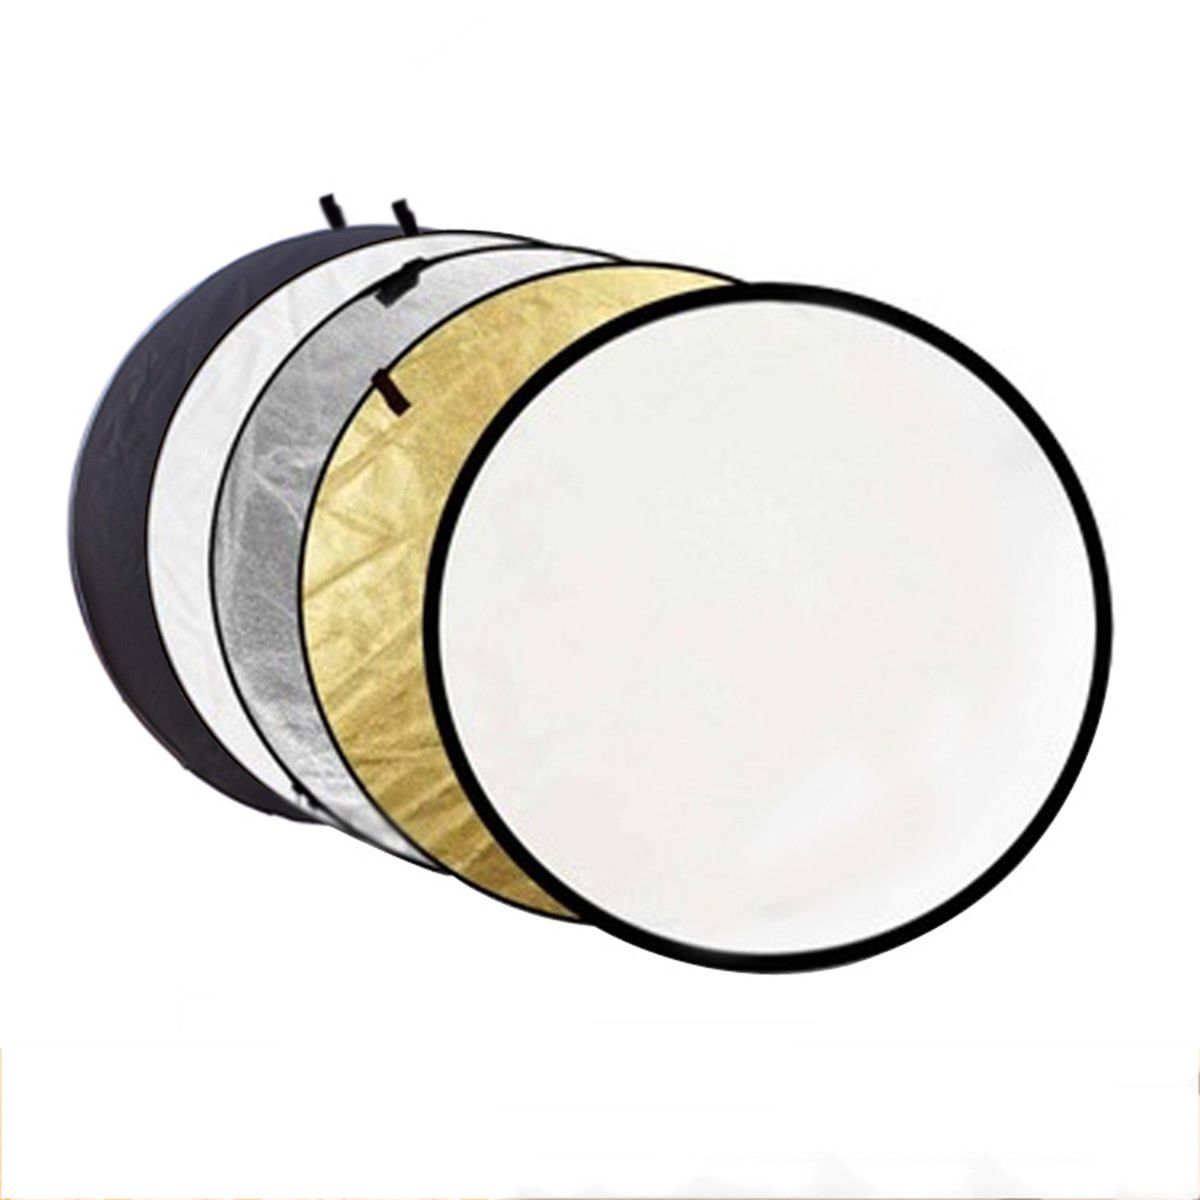 14 51 5 In 1 110cm Photograph Disc Collapsible Light Reflector Studio Multi Photo 43 Ebay Electronics Reflector Photography Multi Photo Reflectors